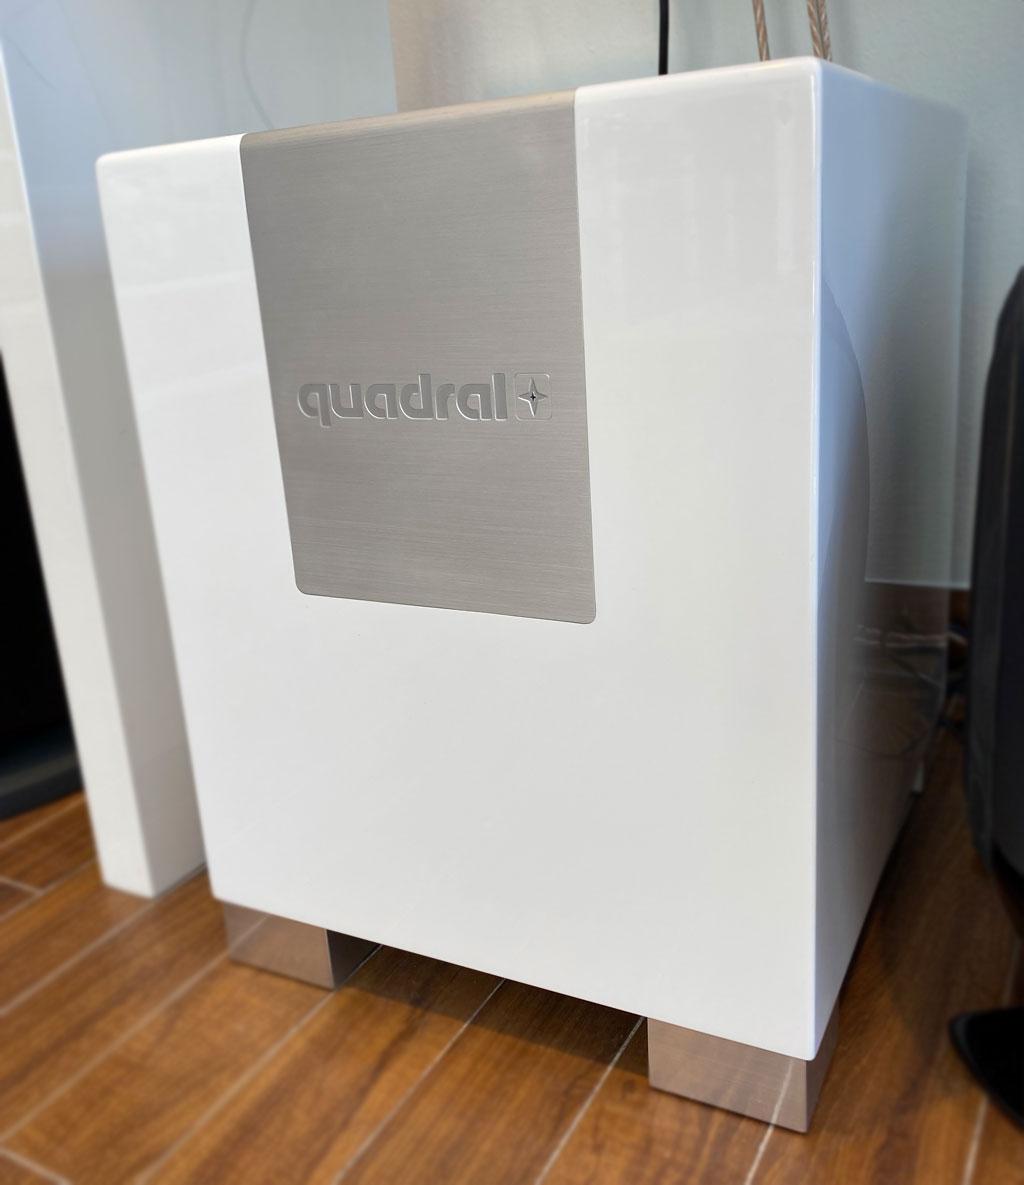 Quadral-Subwoofer-3